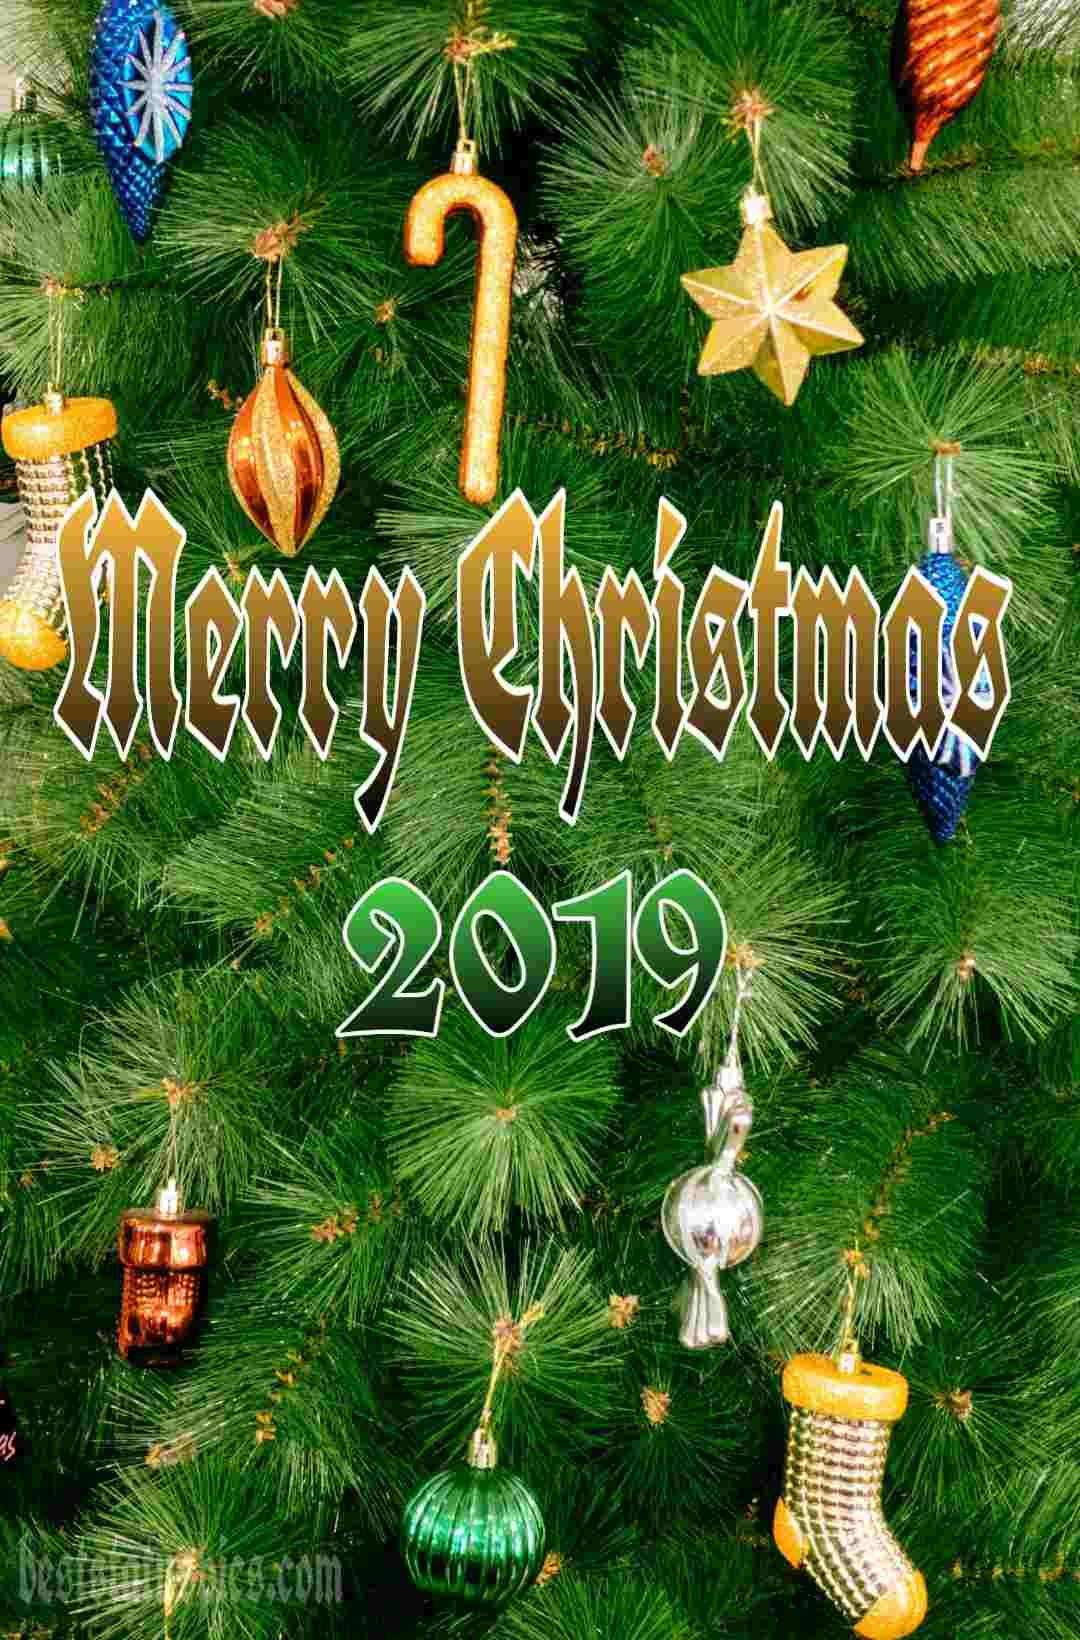 Download Merry Christmas 2019 Whatsapp Status Free